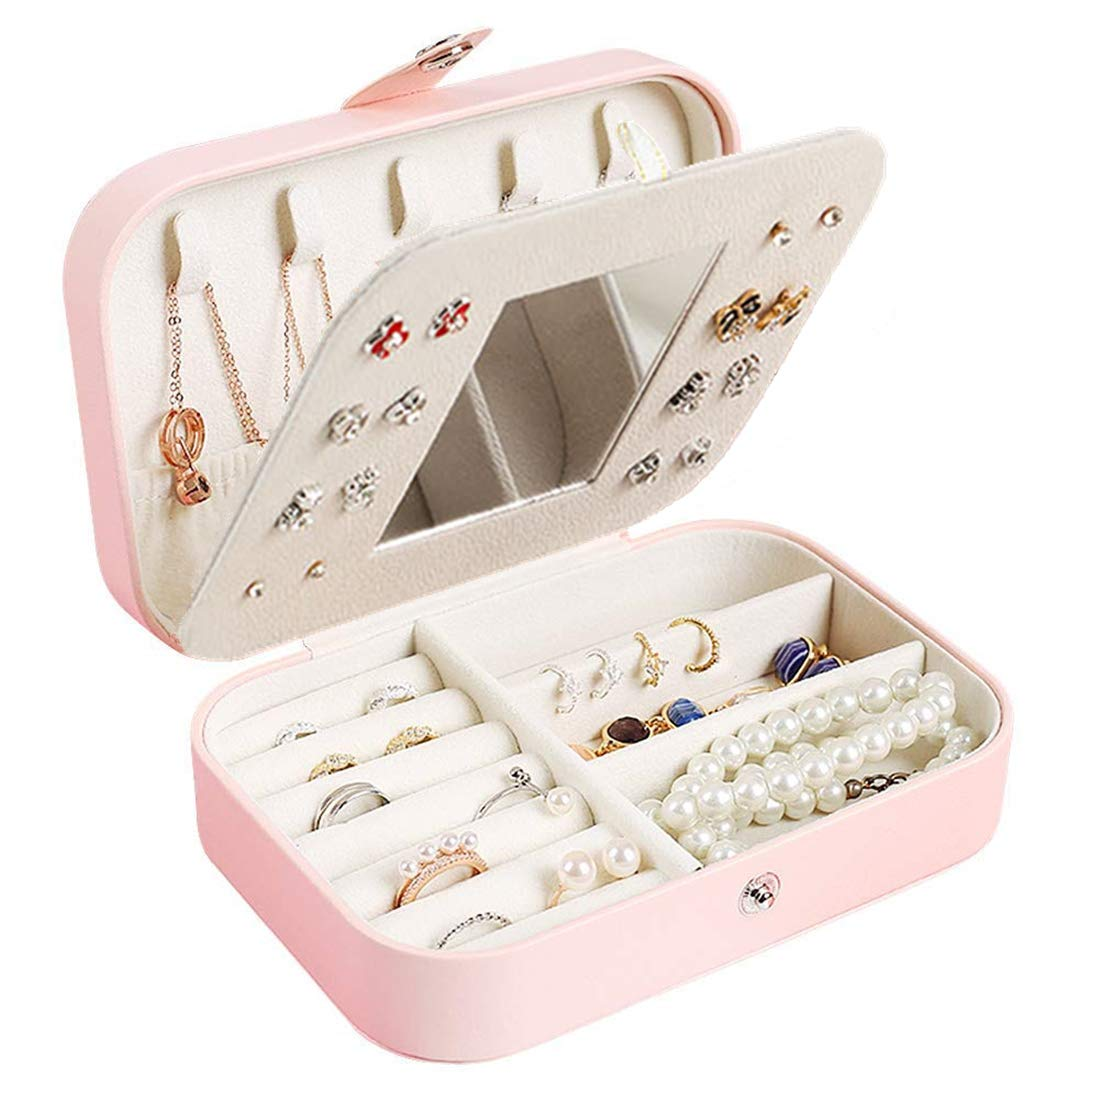 Pendientes para Mujer Pulseras Collares Yolistar Caja Joyero Peque/ña de PU Joyero Viaje Cajas para Joyas Jewelry Organizer para Mujer para Anillos Joyero de Viaje Port/átil